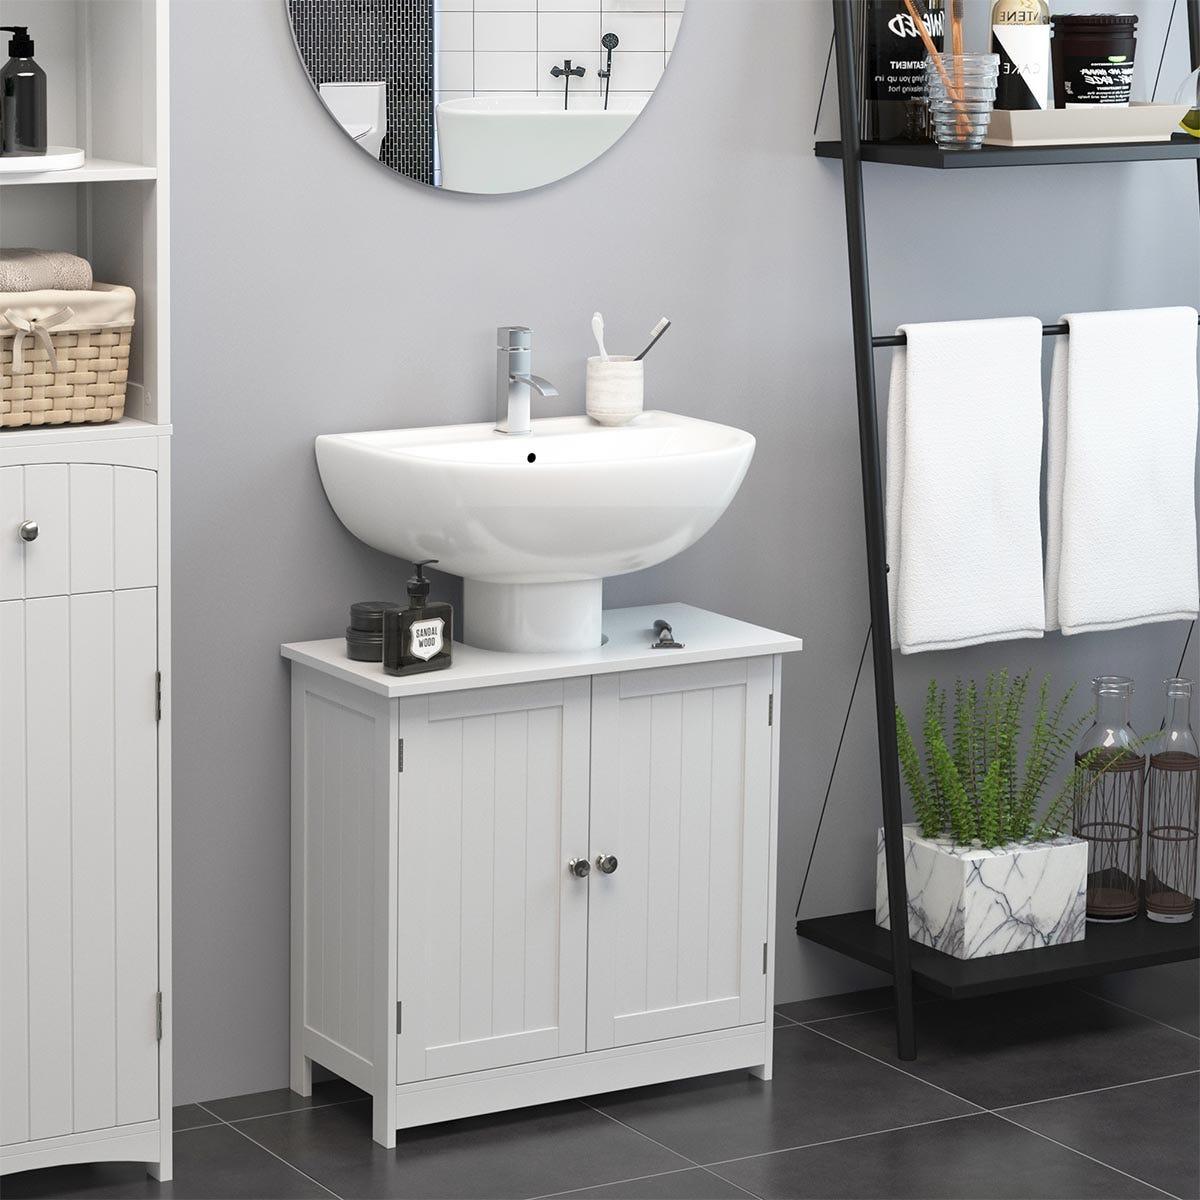 HOMCOM Basin Vanity Cabinet - White